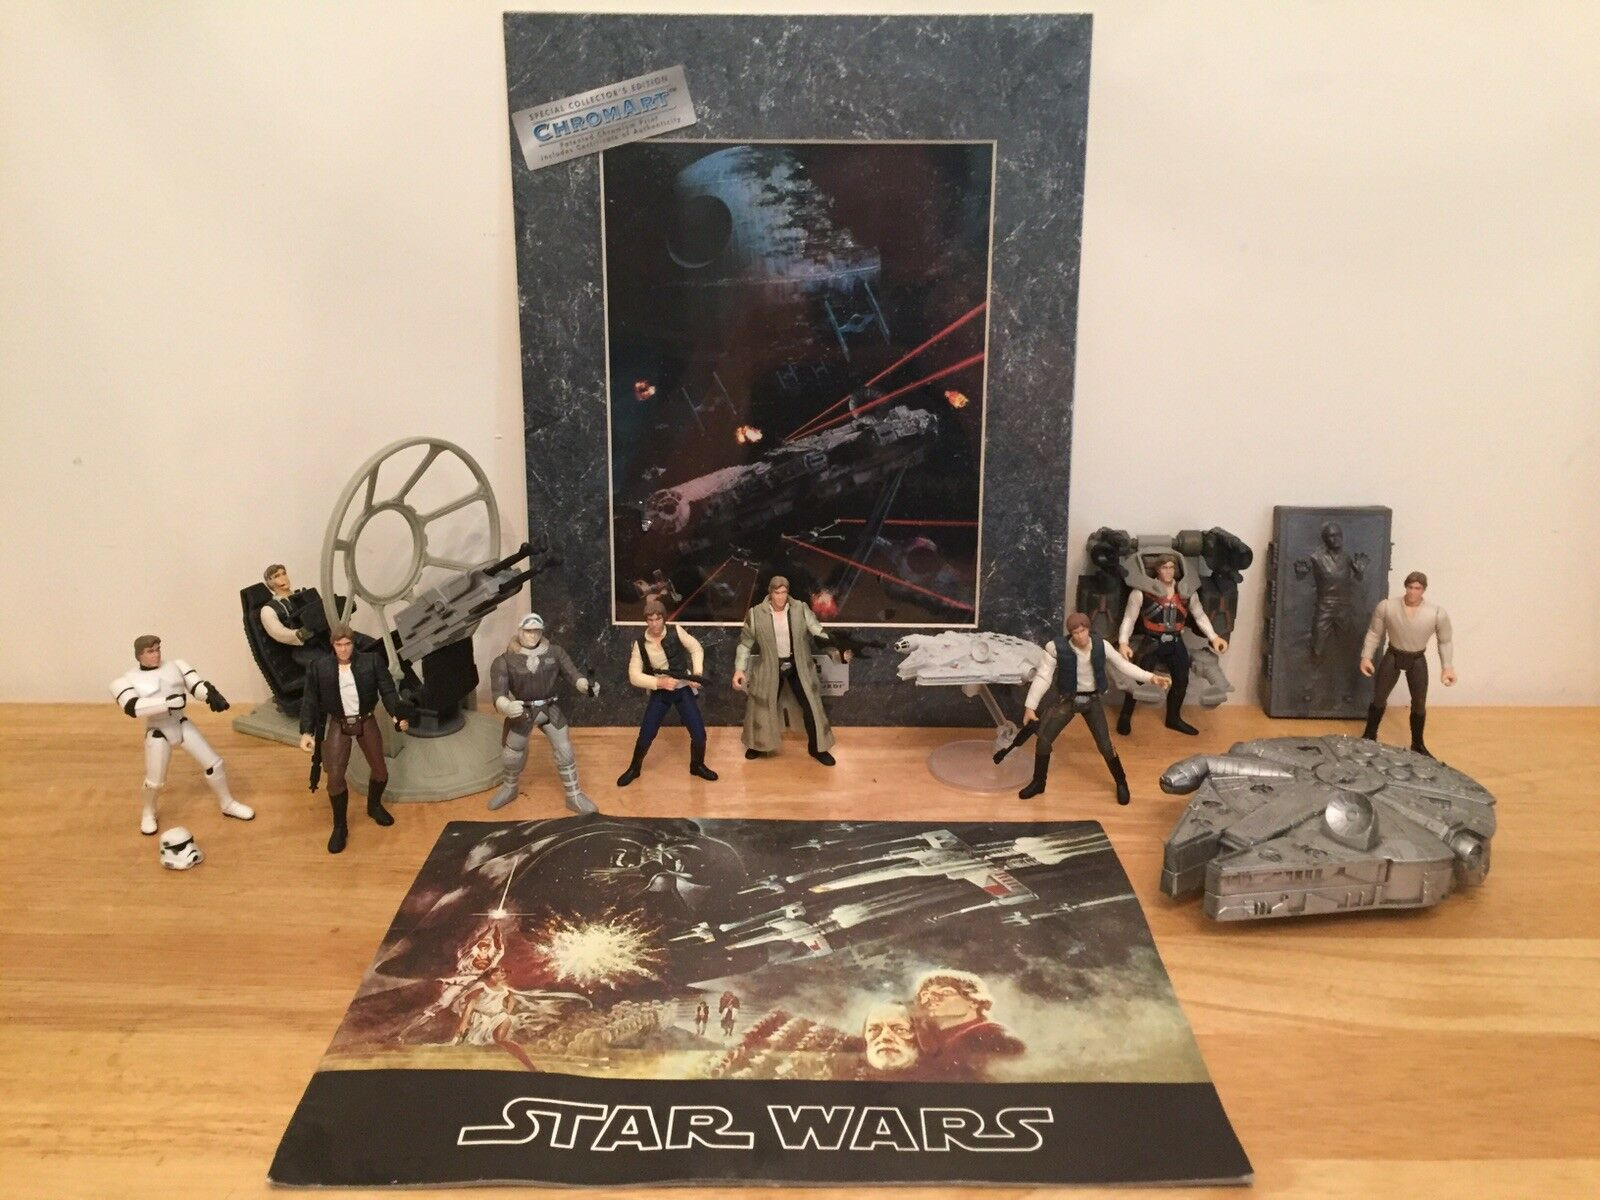 Star Wars - Han Solo / Millennium Falcon lot